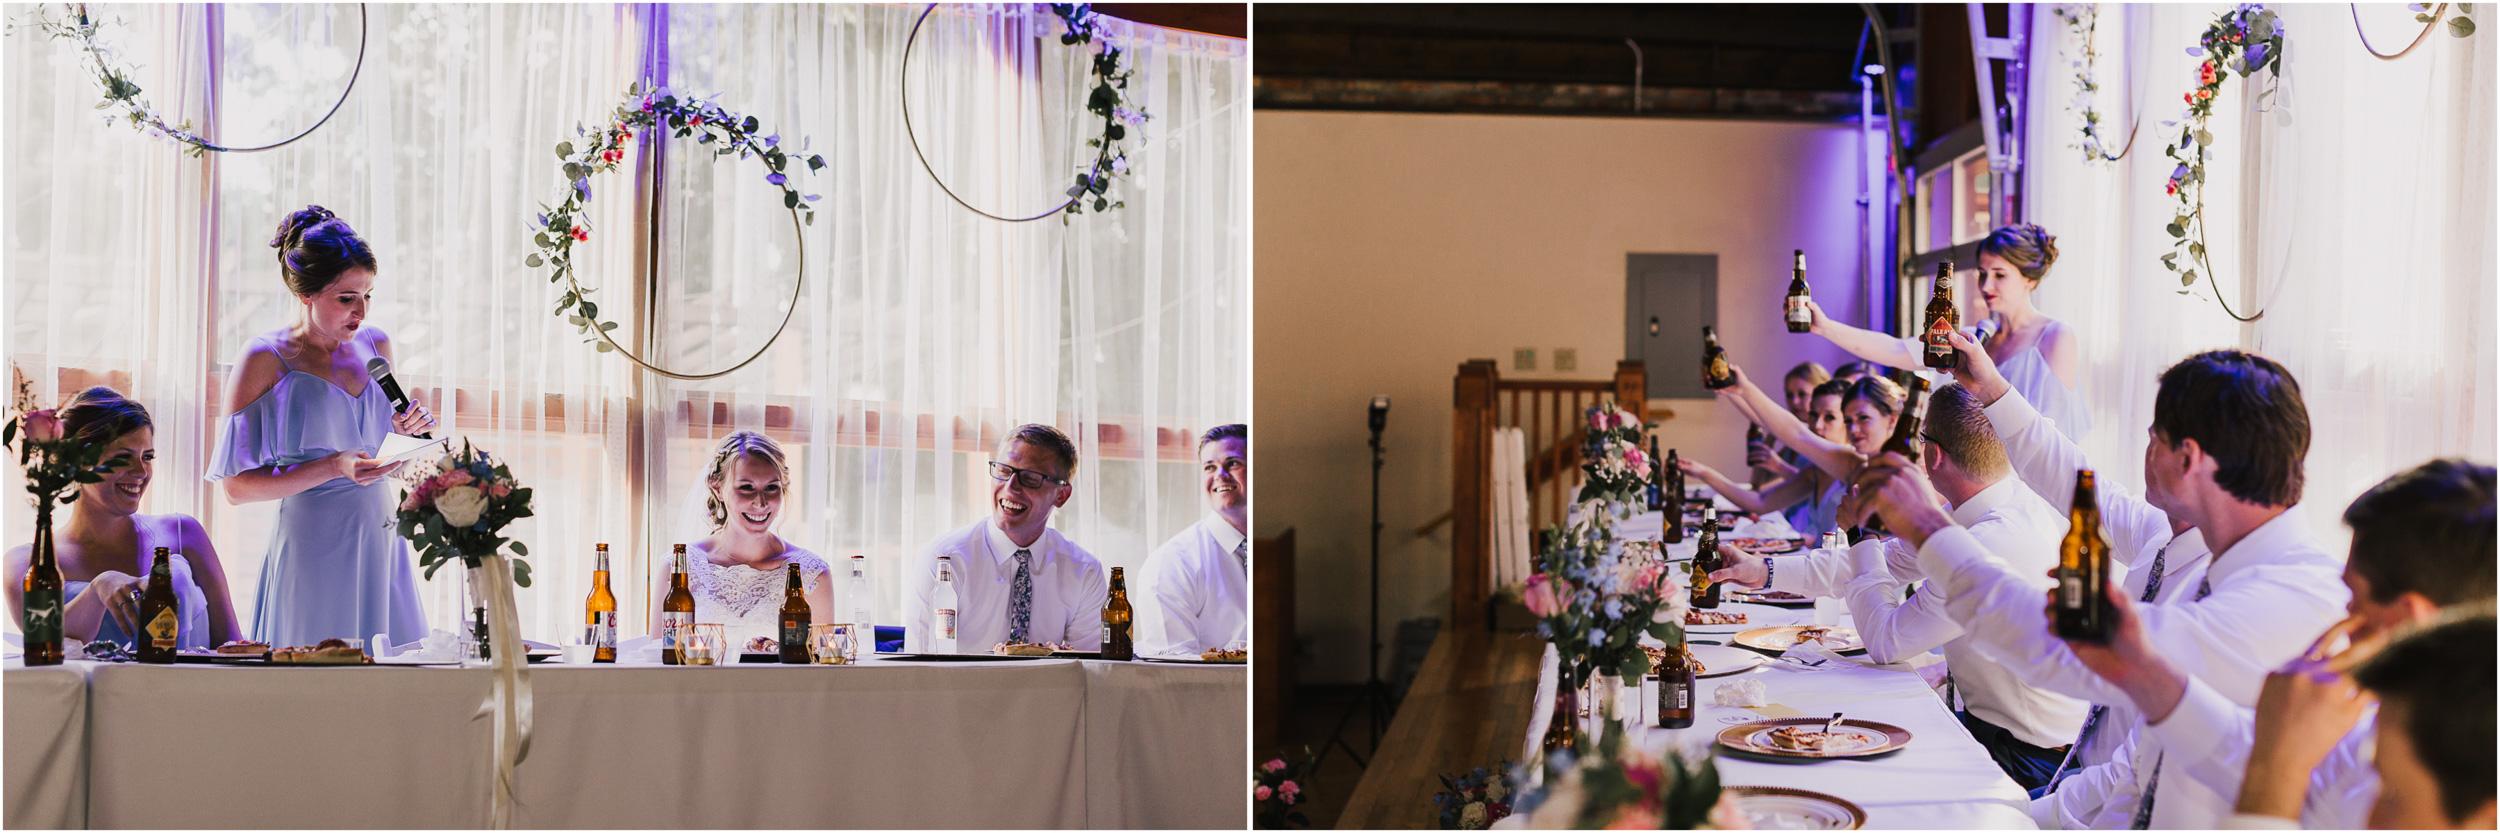 alyssa barletter photography classic kansas city summer wedding photographer dustin and erica king-64.jpg